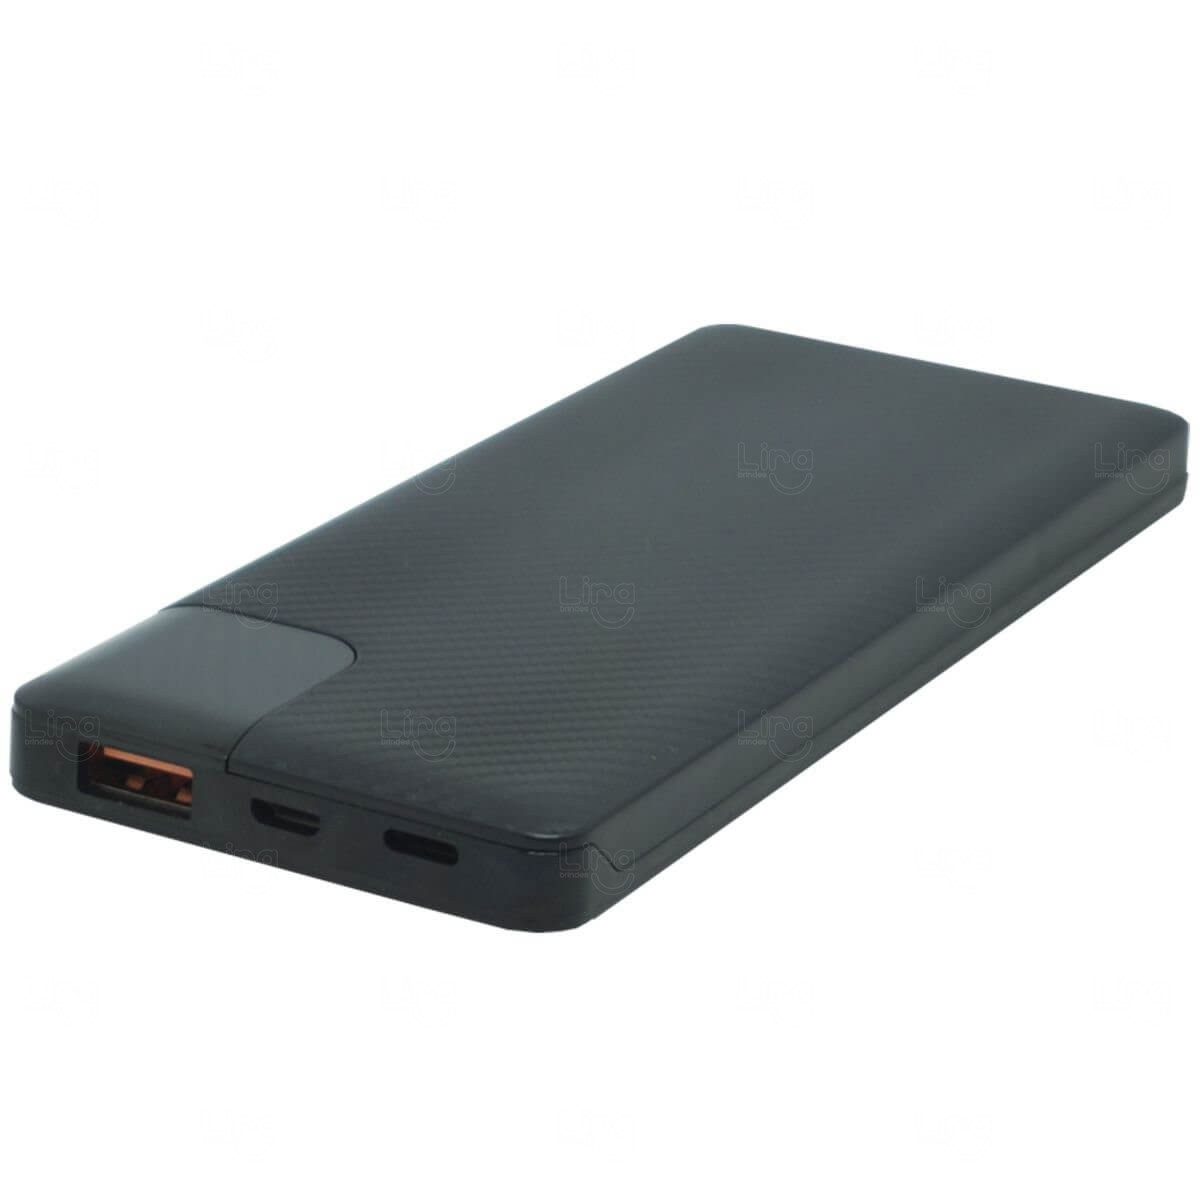 Power Bank Portátil Slim Personalizado - 10.000 mAh